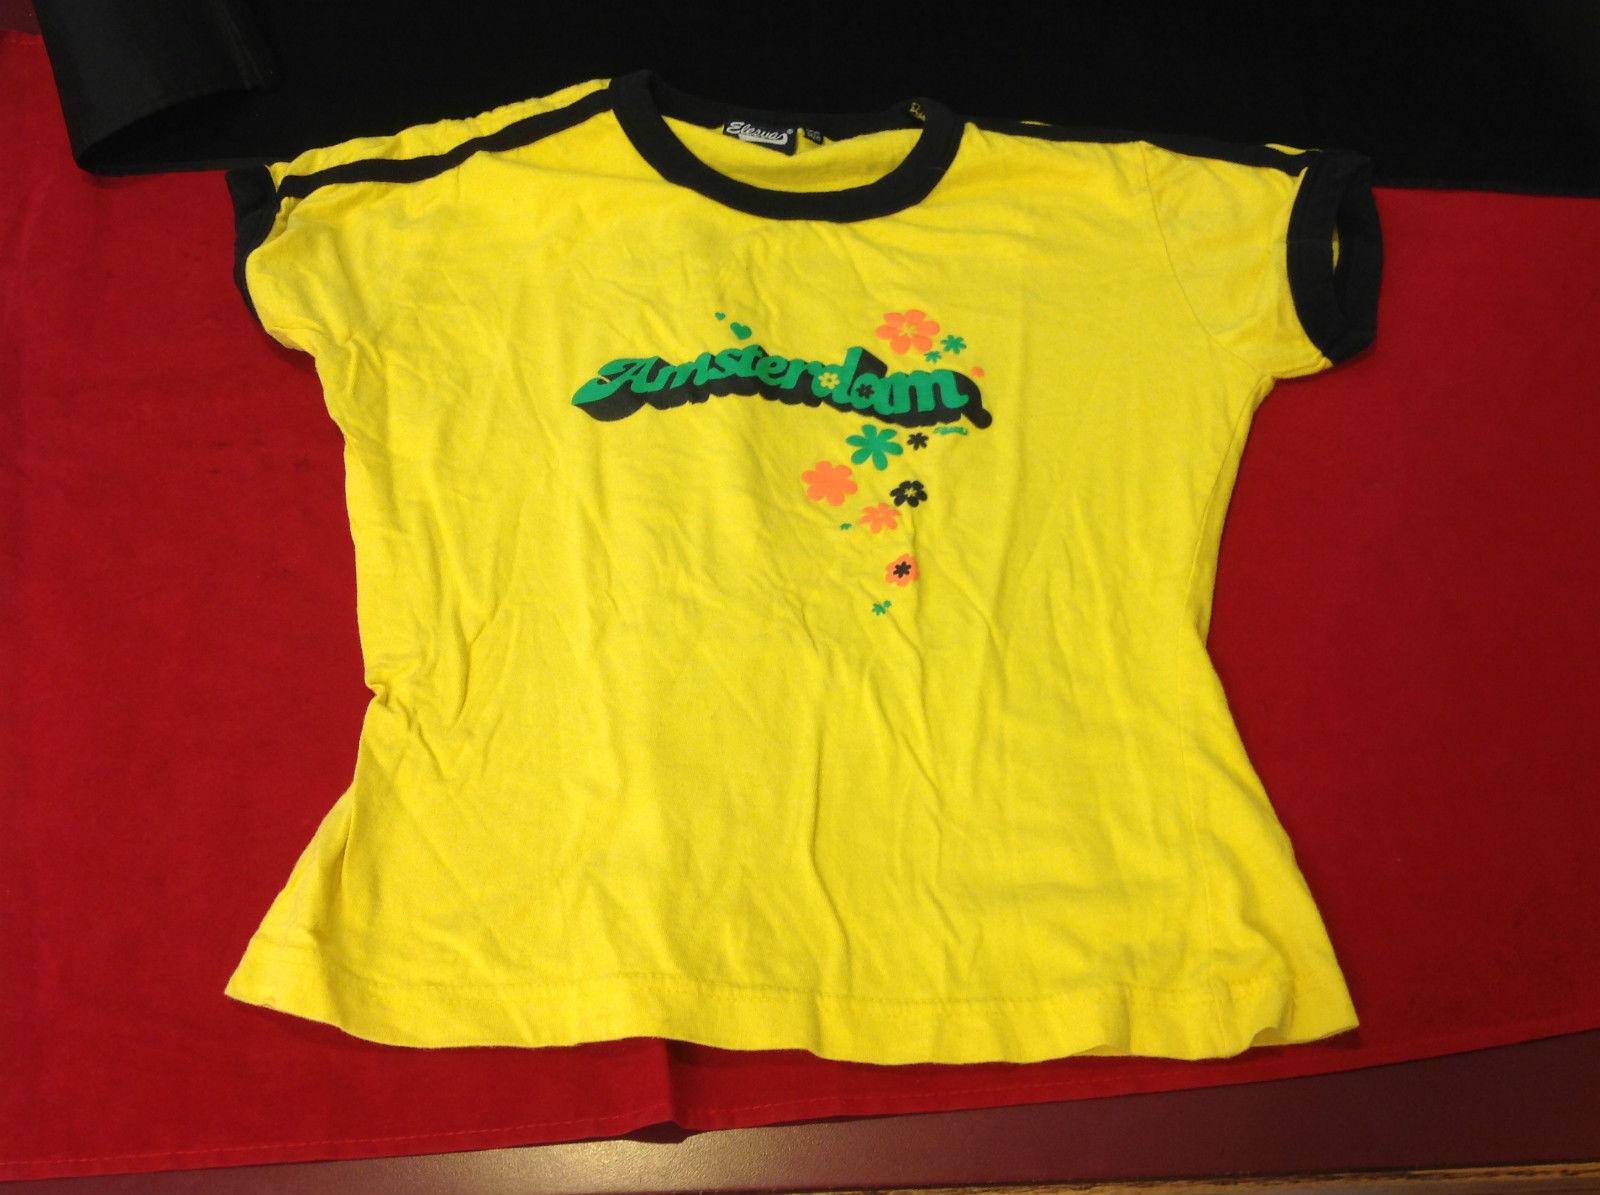 Elesua Ladies Yellow Graphic Shirt Amsterdam with Flowers One Size